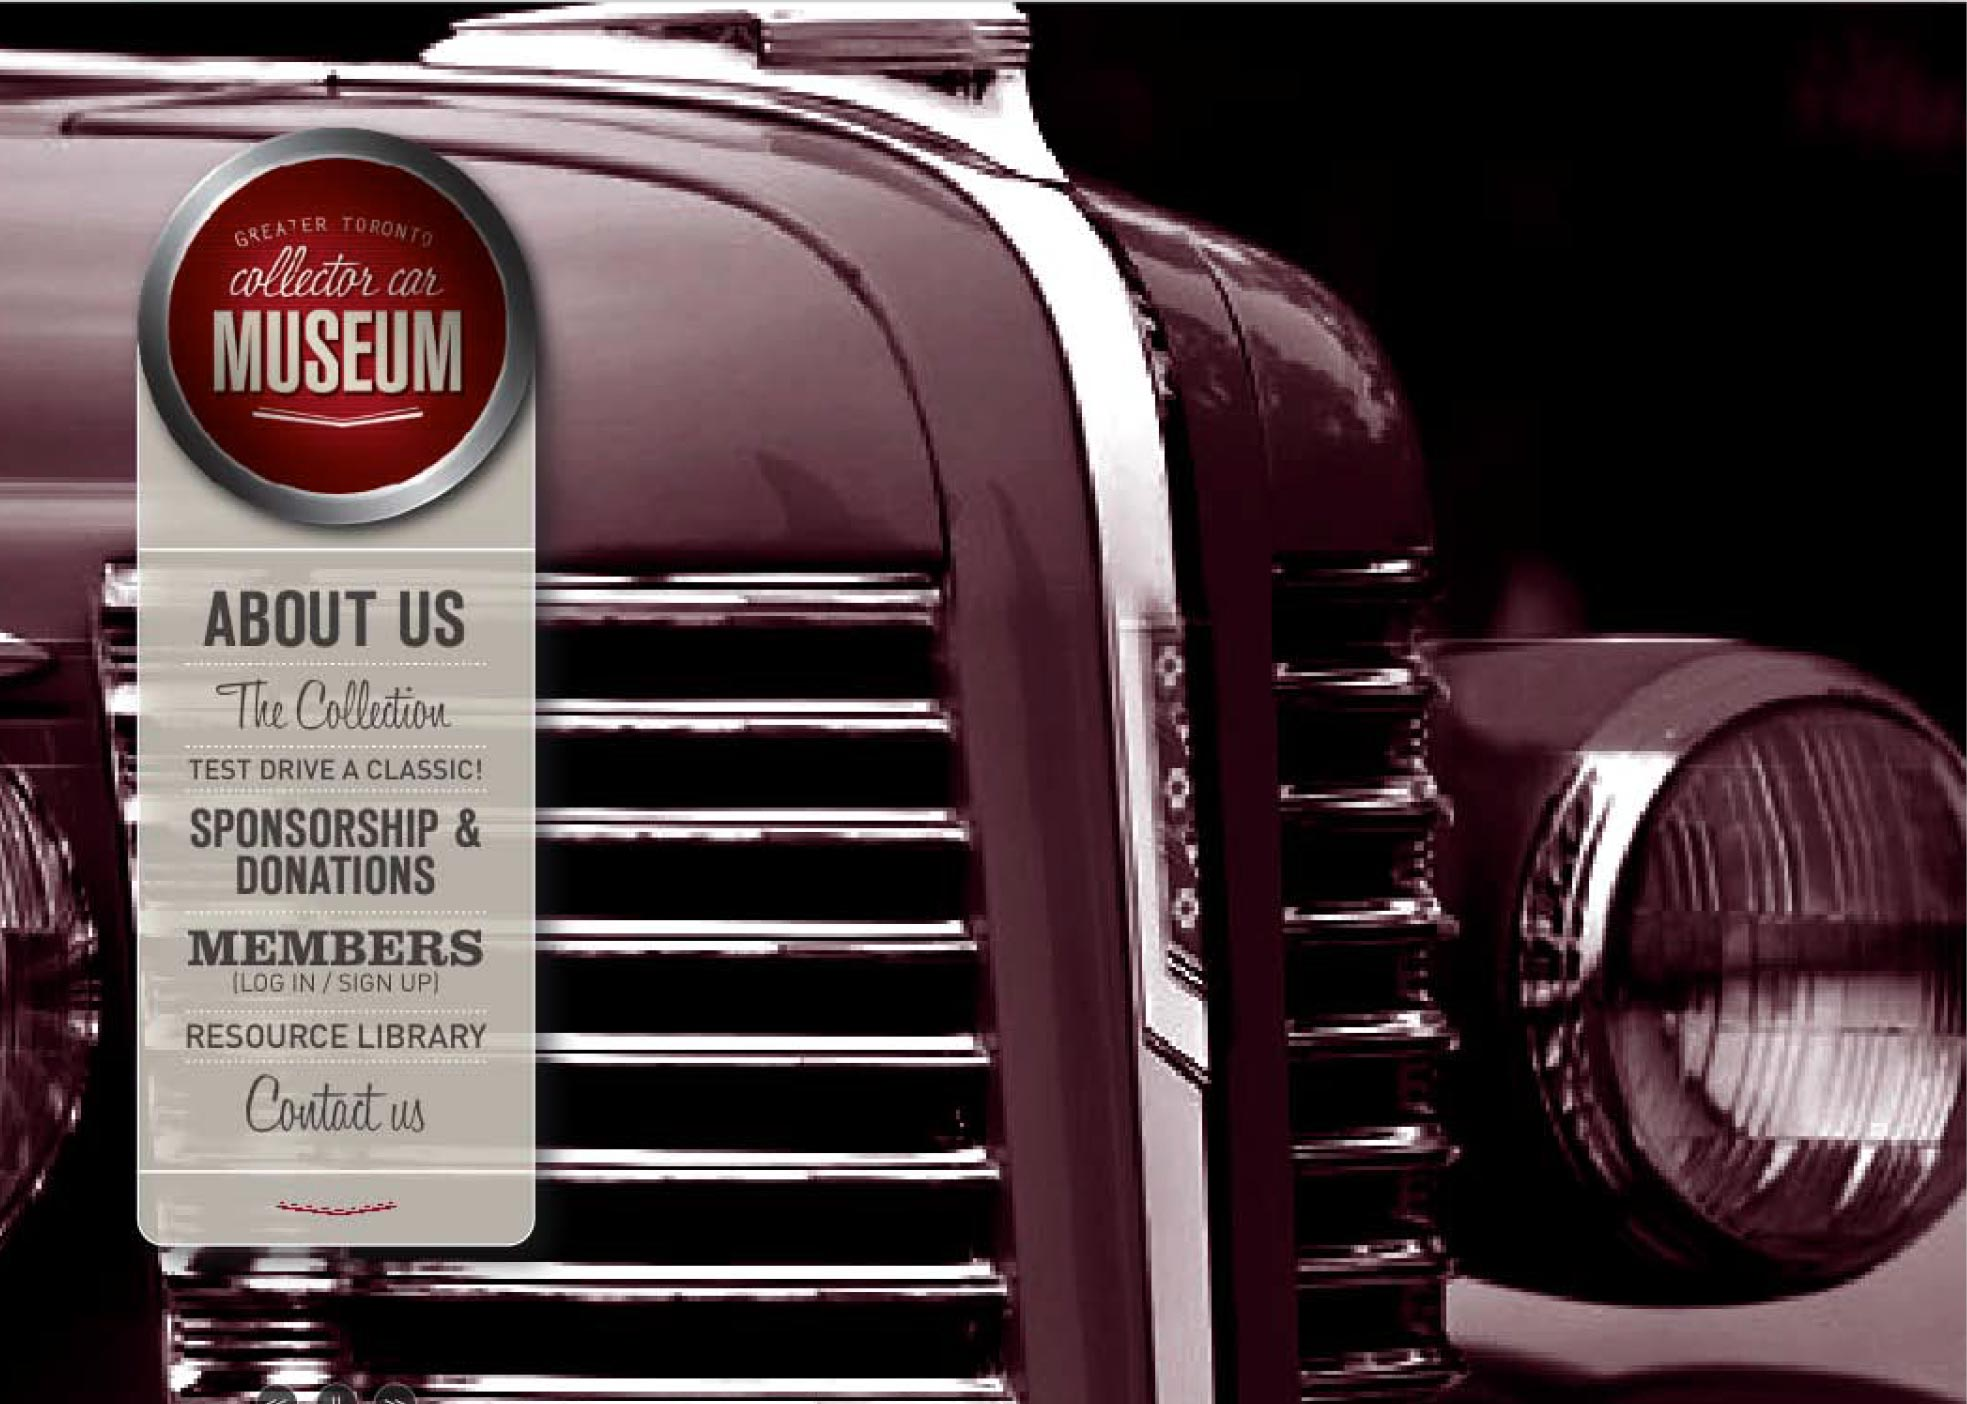 greater-toronto-collector-car-museum-website-sputnik-design-partners.jpg